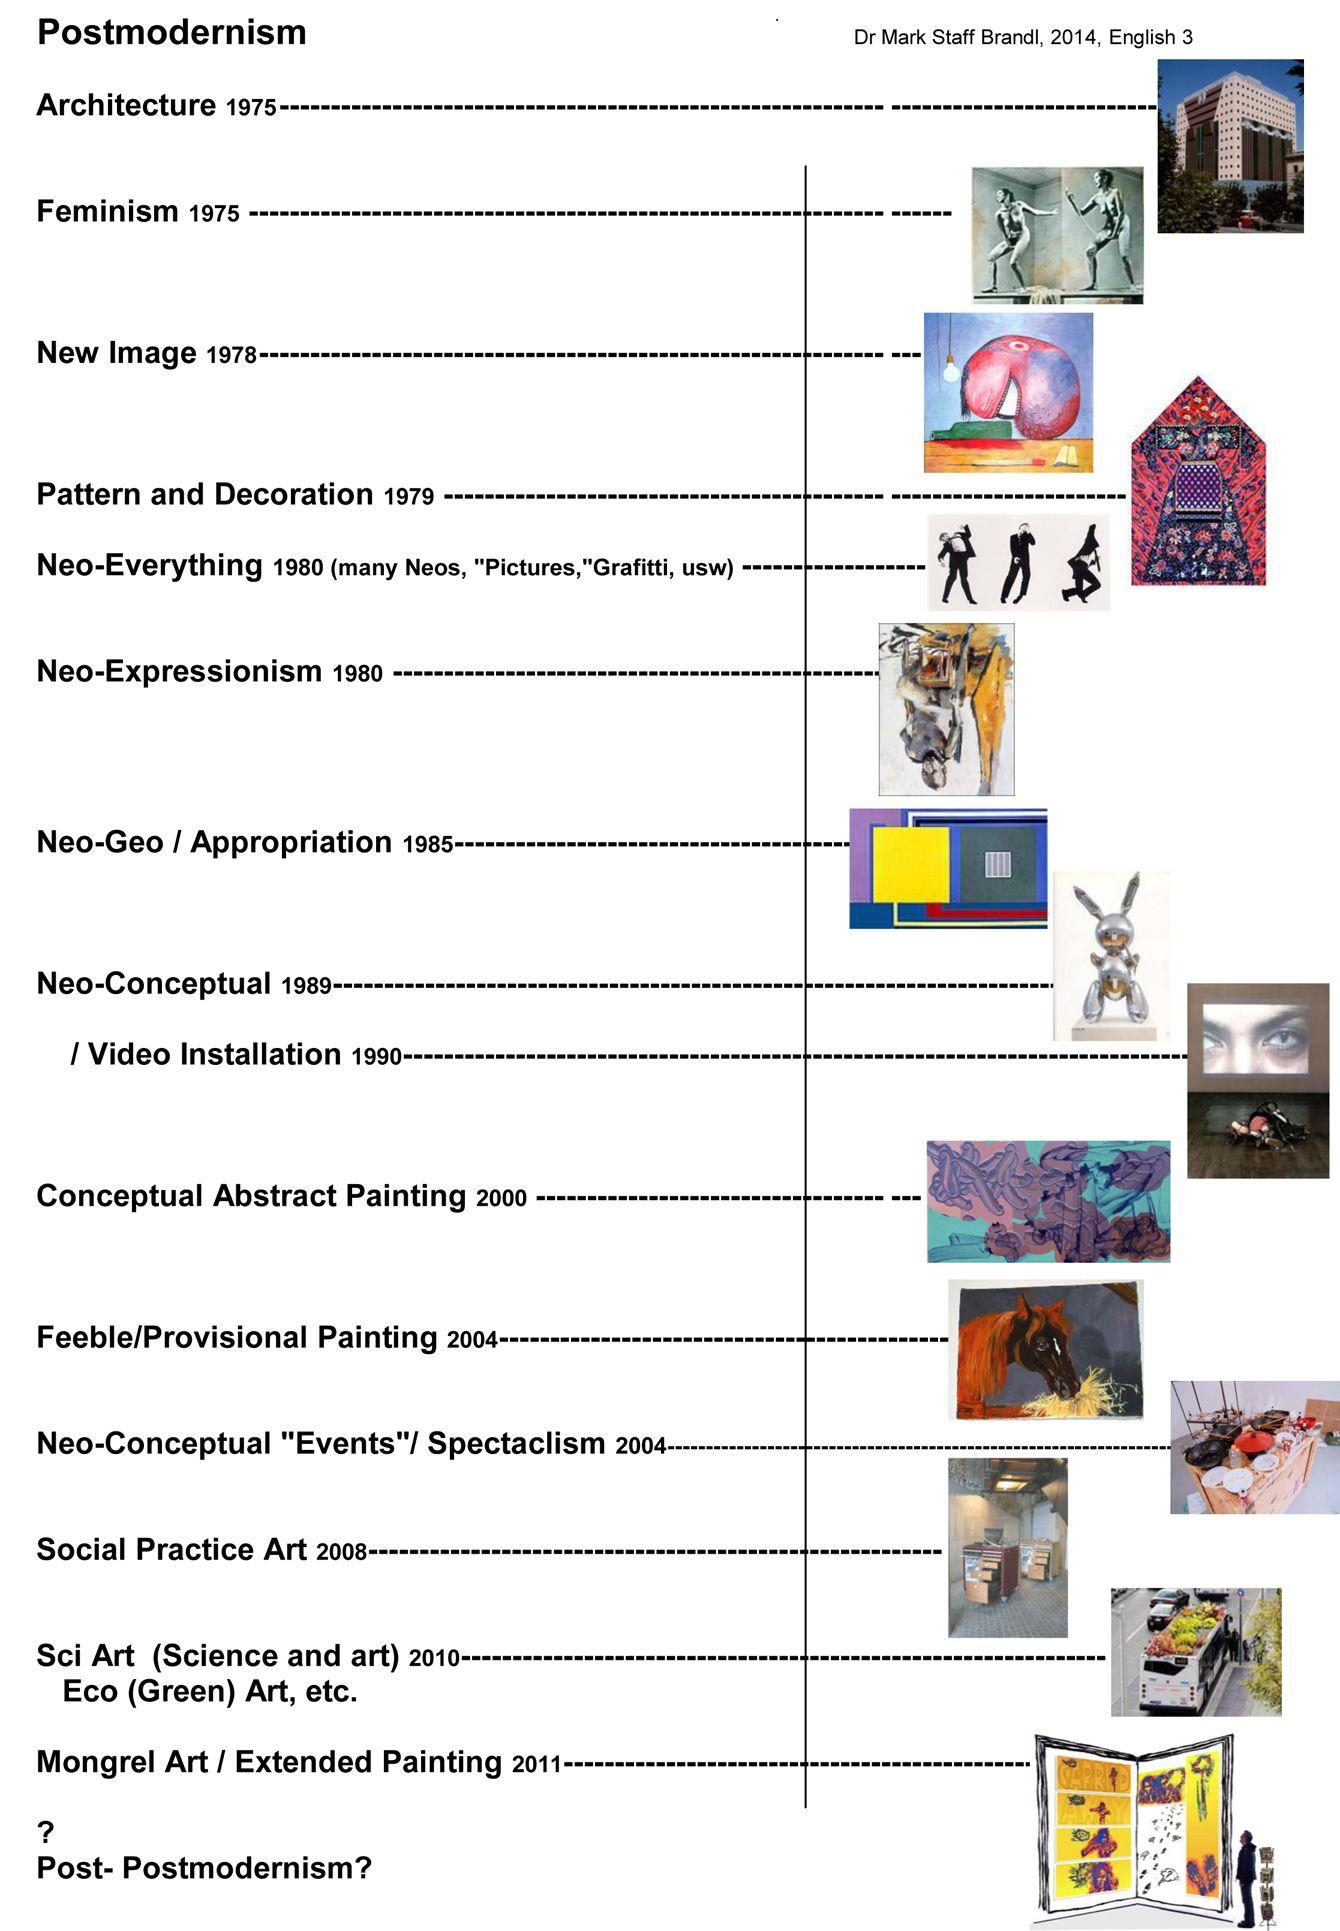 Post Modernism Art History Timeline | Art history timeline